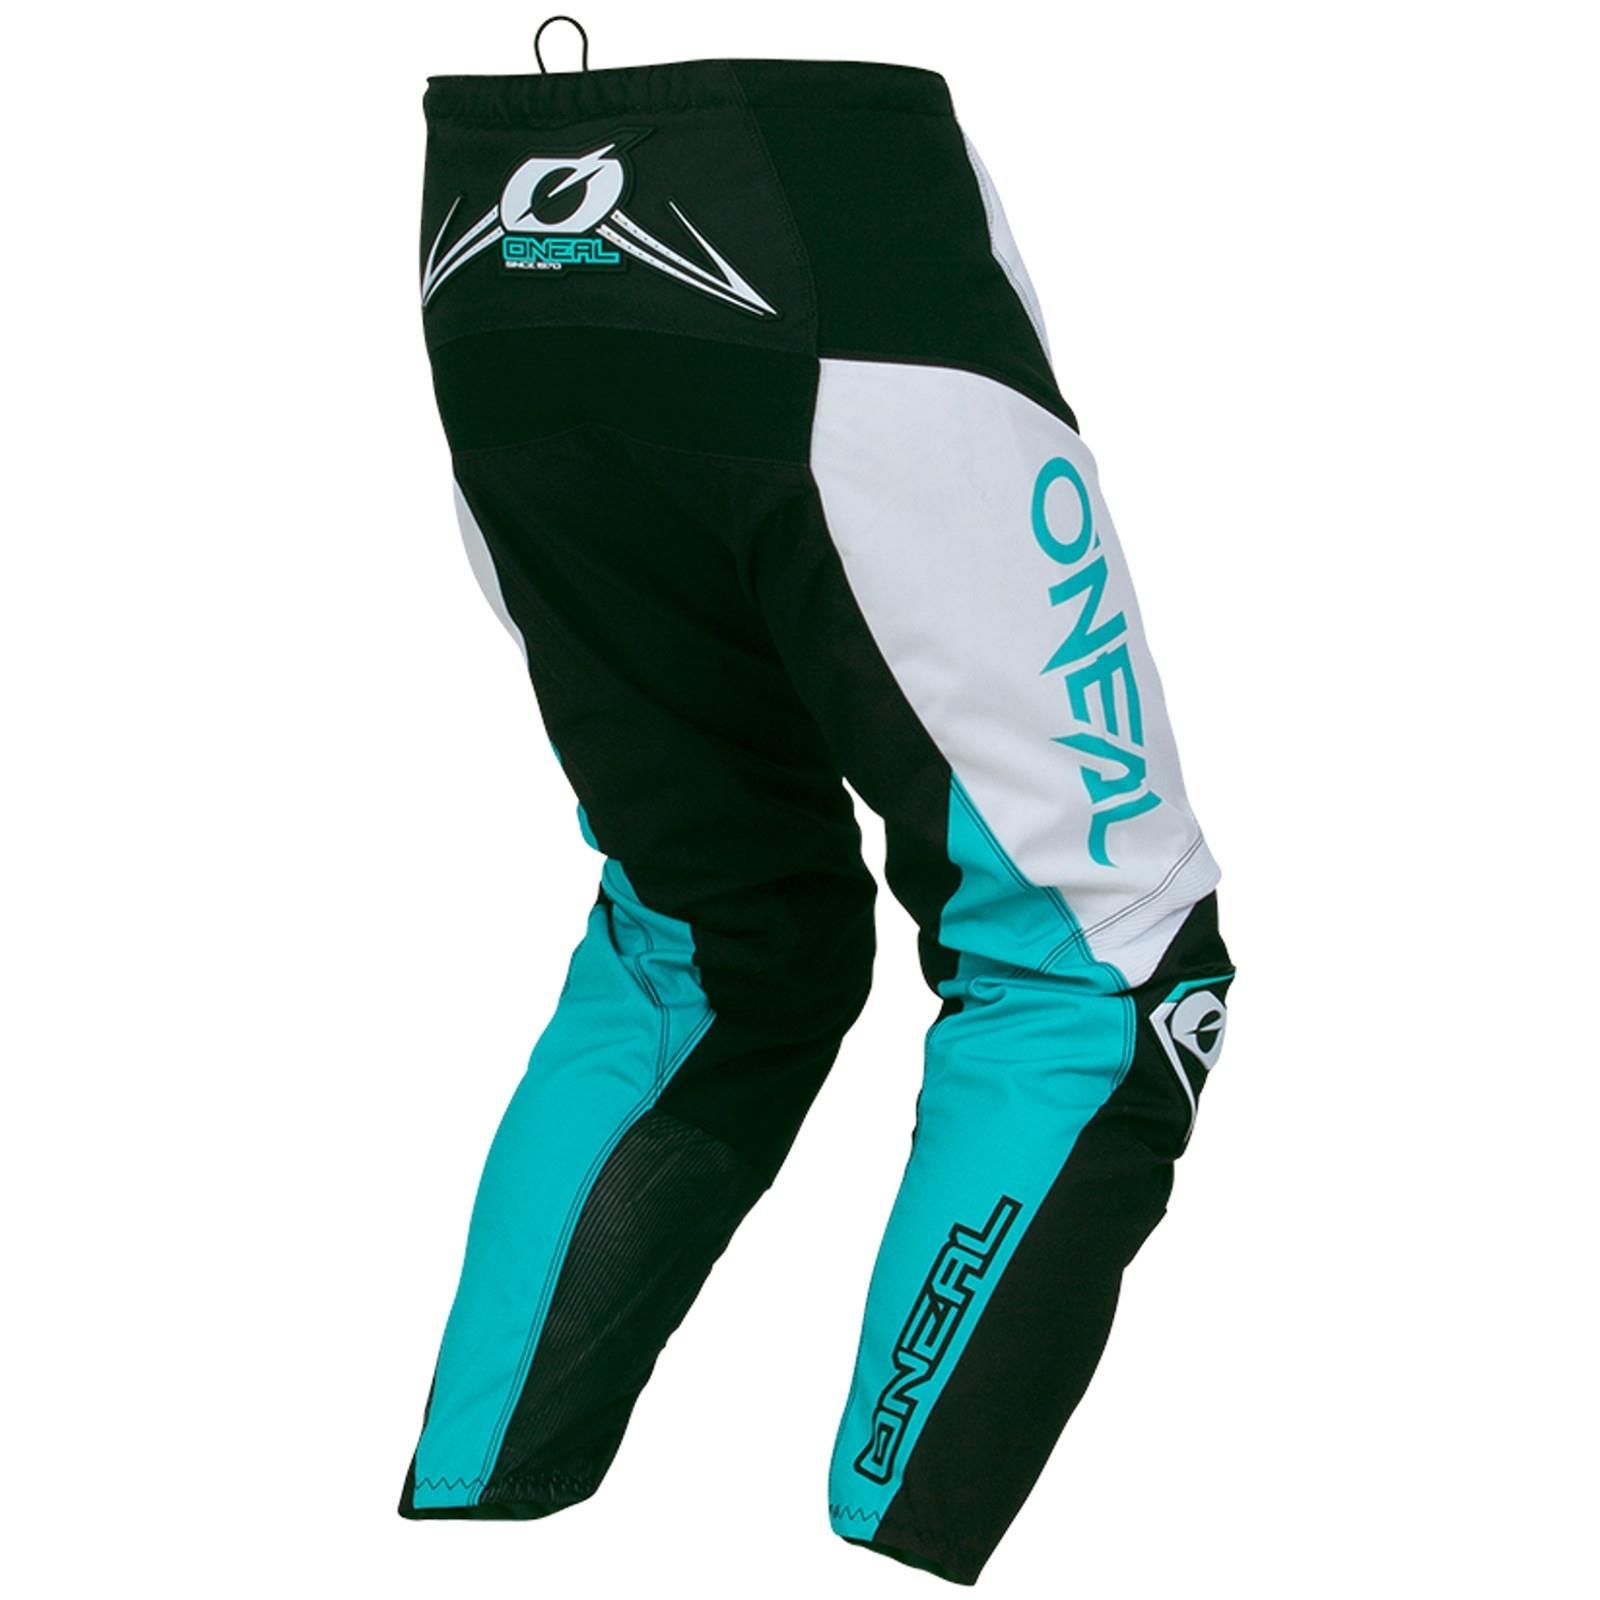 Oneal-elemento-Mayhem-Hardwear-Pants-pantalones-MX-DH-FR-Moto-Cross-Enduro-MTB-moto miniatura 51